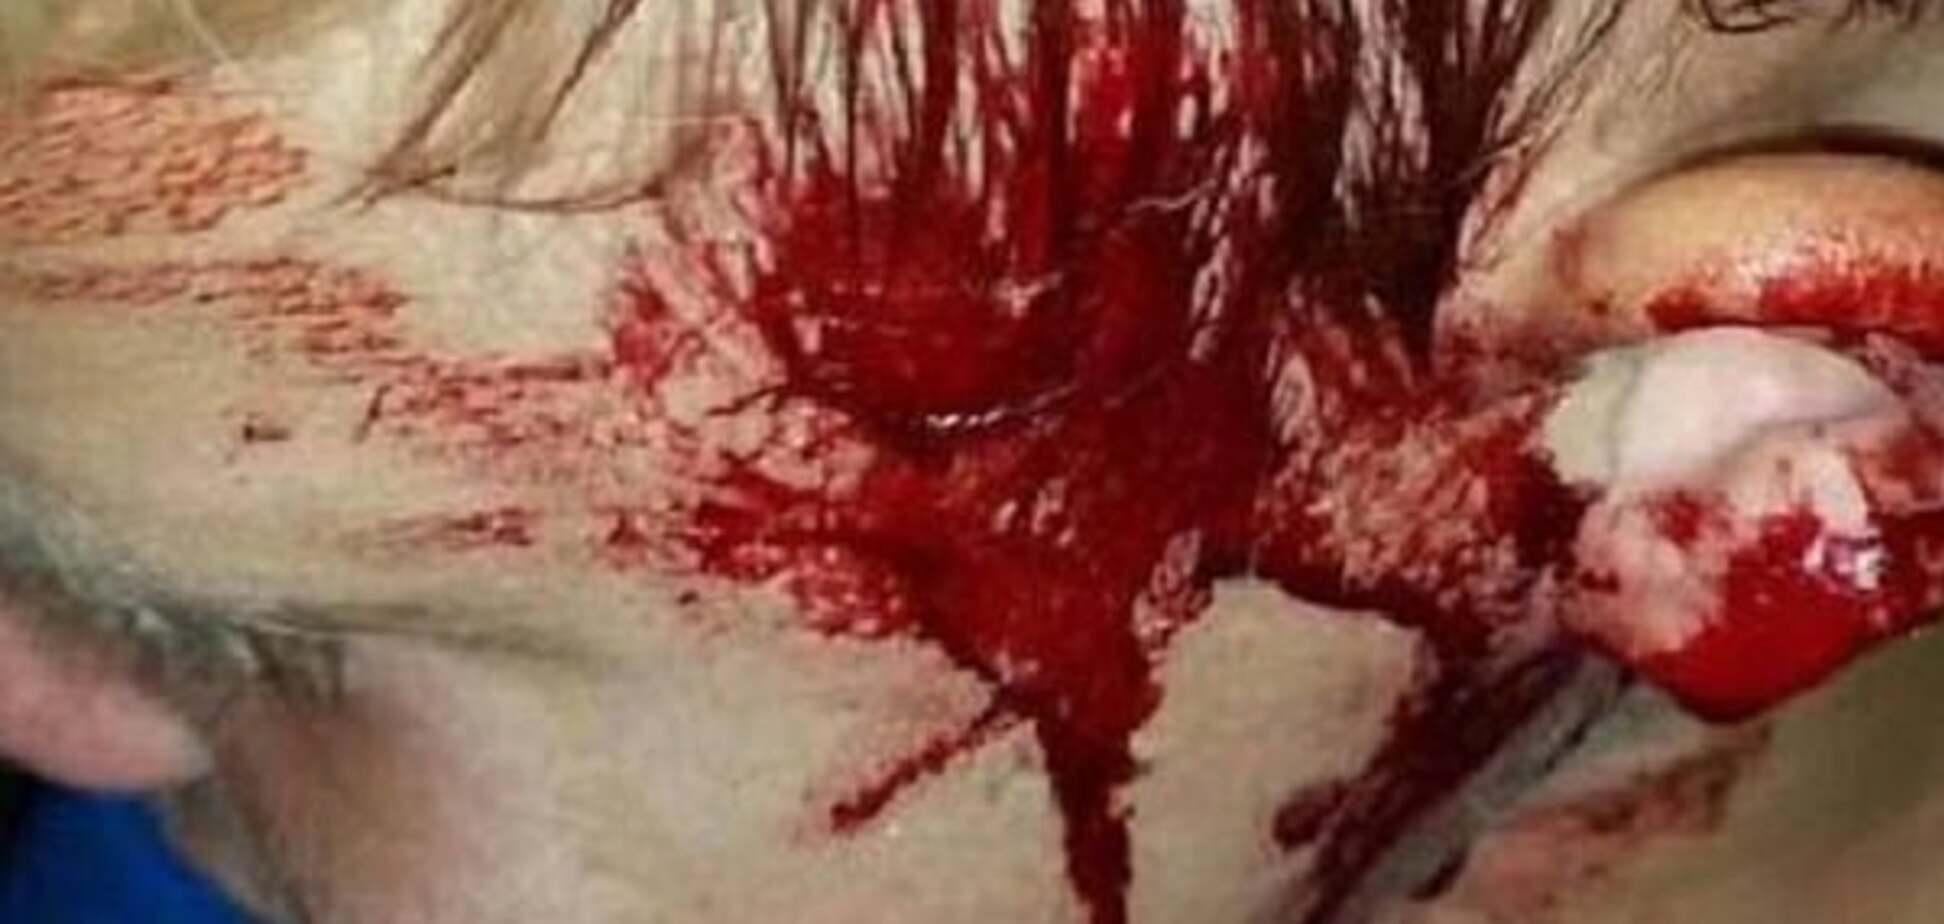 Страшный случай в Австралии: гигантский питон едва не съел ребенка